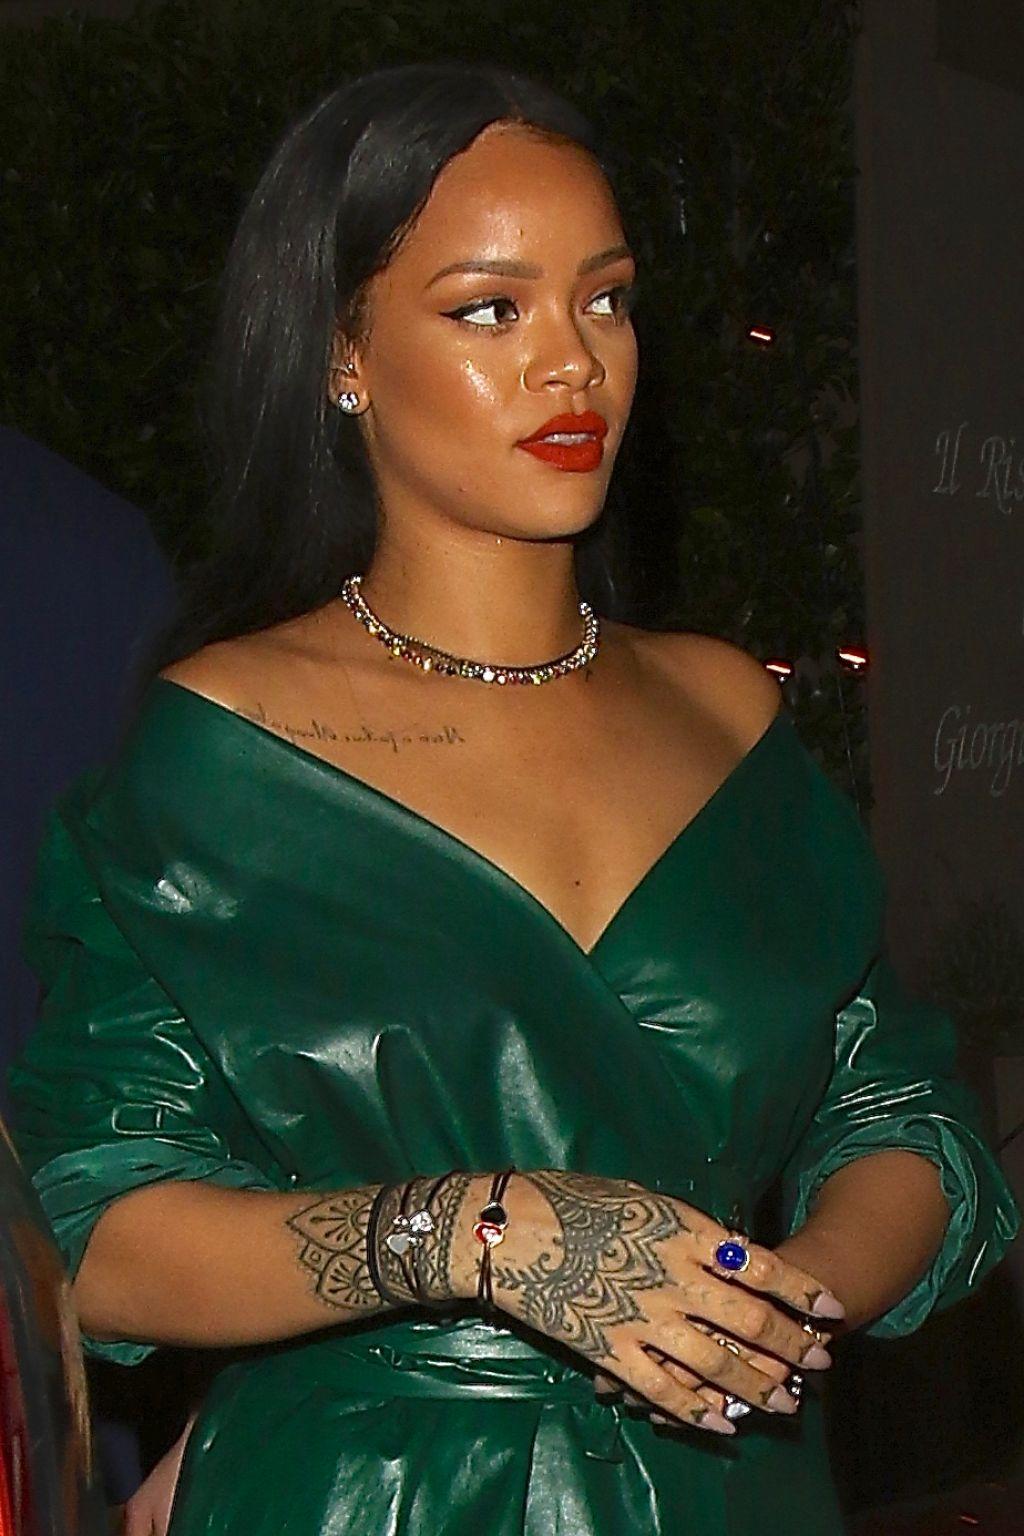 Rihanna Night Out Style Leaving Dinner At Giorgio Baldi